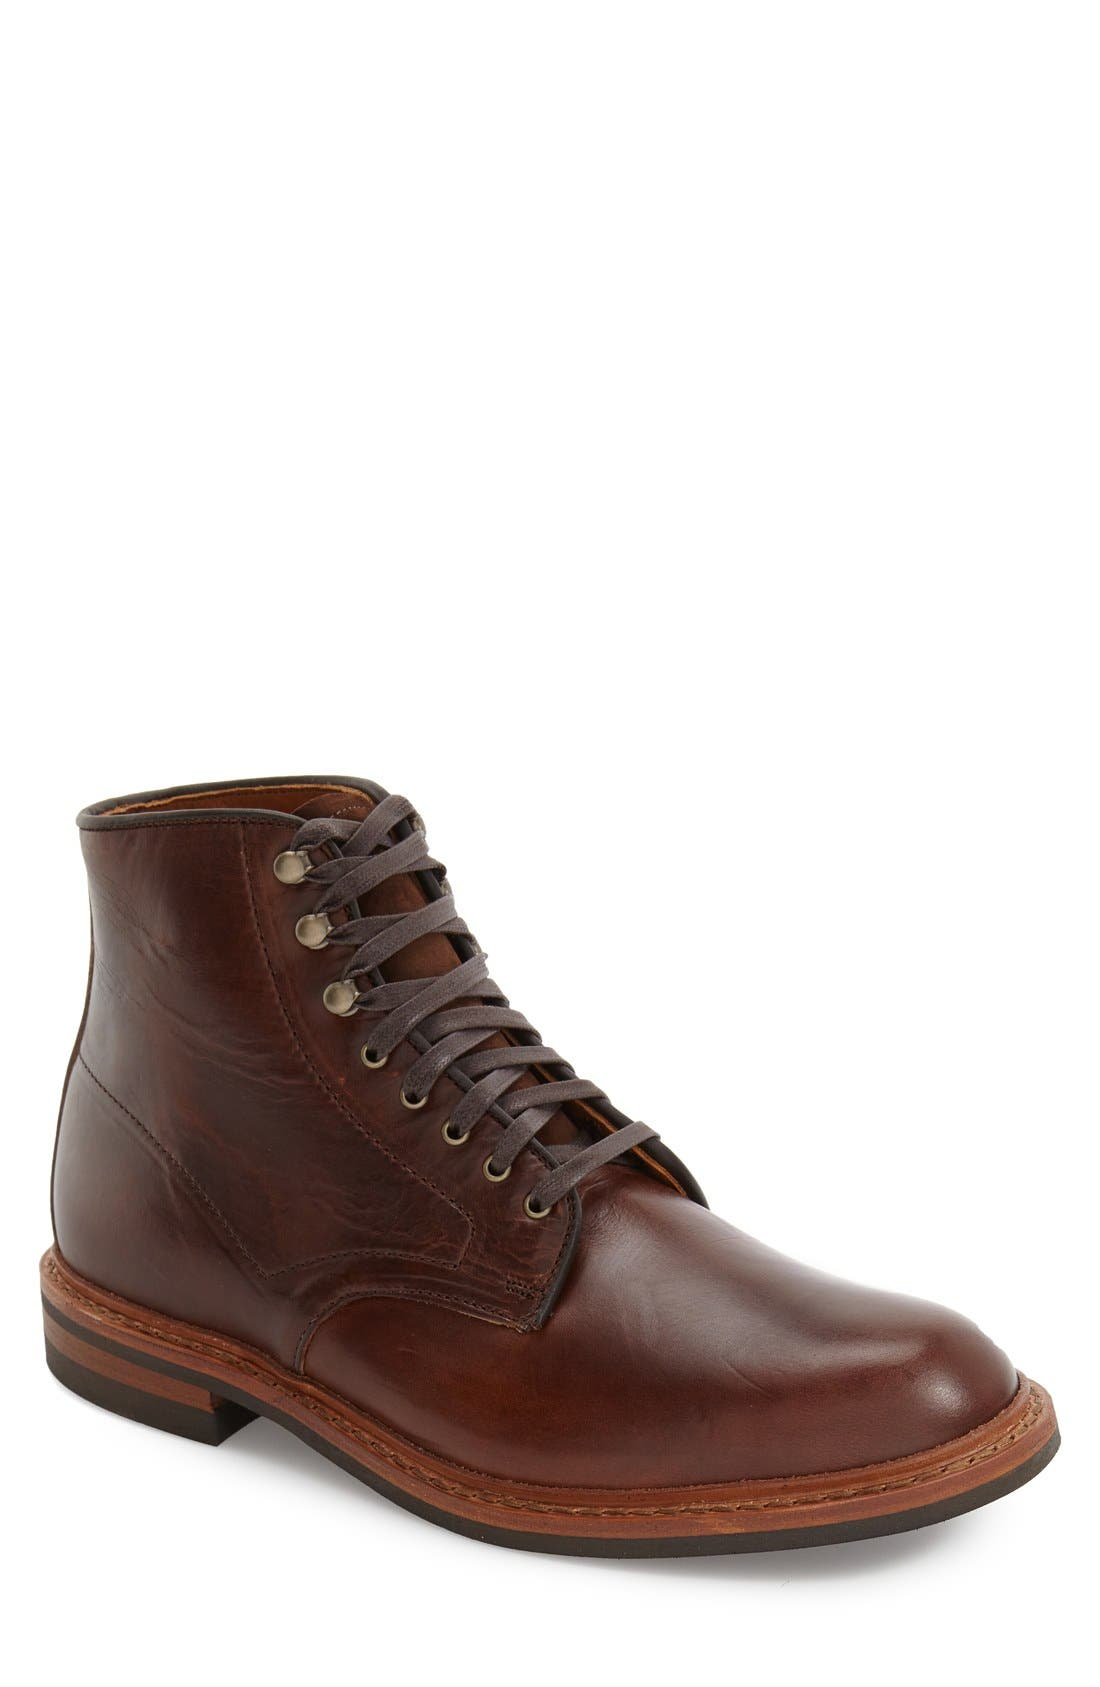 Alternate Image 1 Selected - Allen Edmonds 'Higgins Mill' Plain Toe Boot (Men)